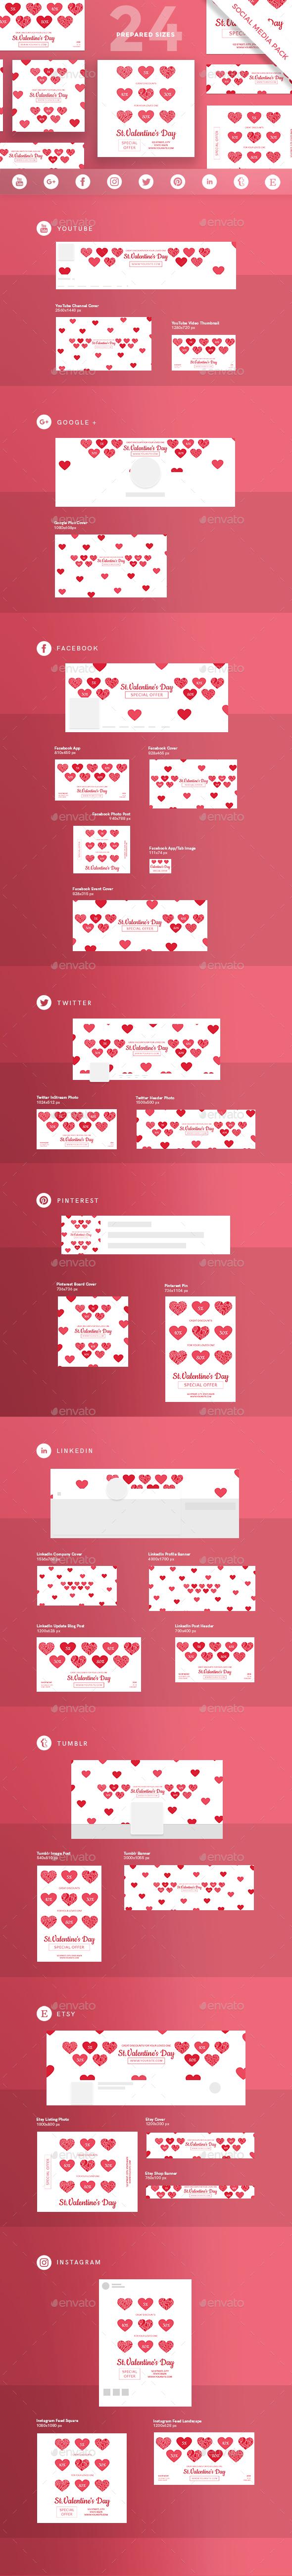 Valentine's Day Social Media Pack - Miscellaneous Social Media